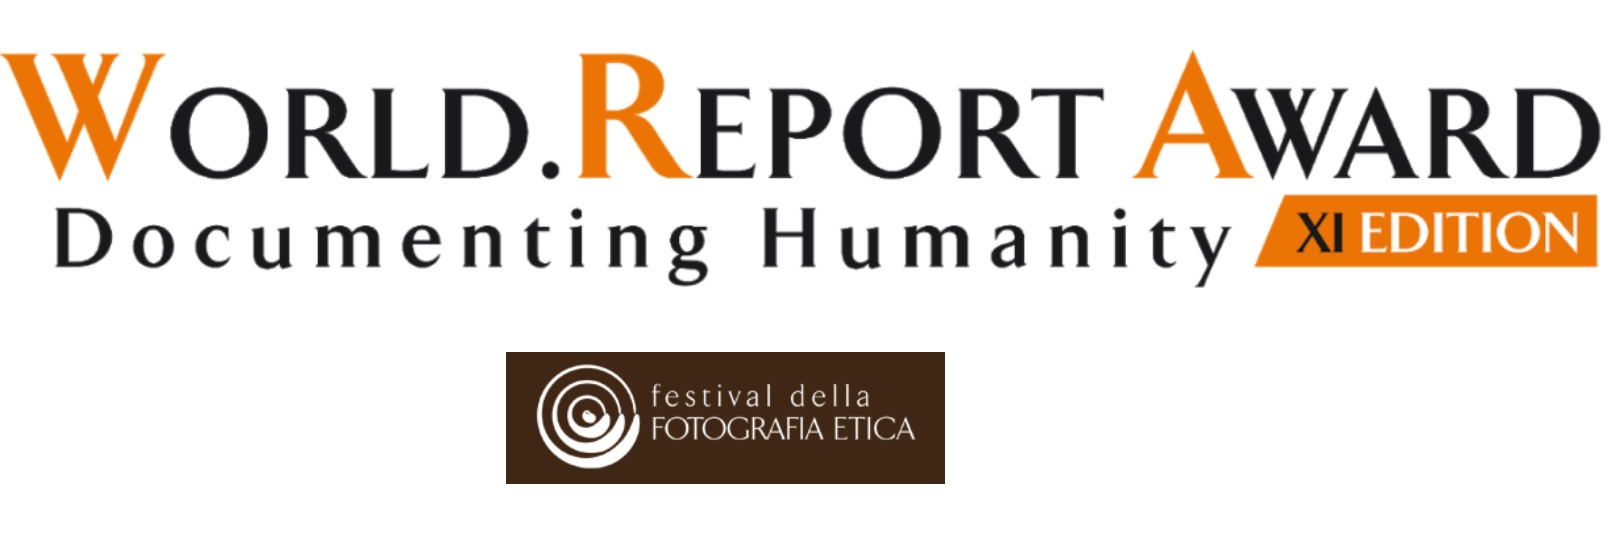 World Report Award 2021 - logo